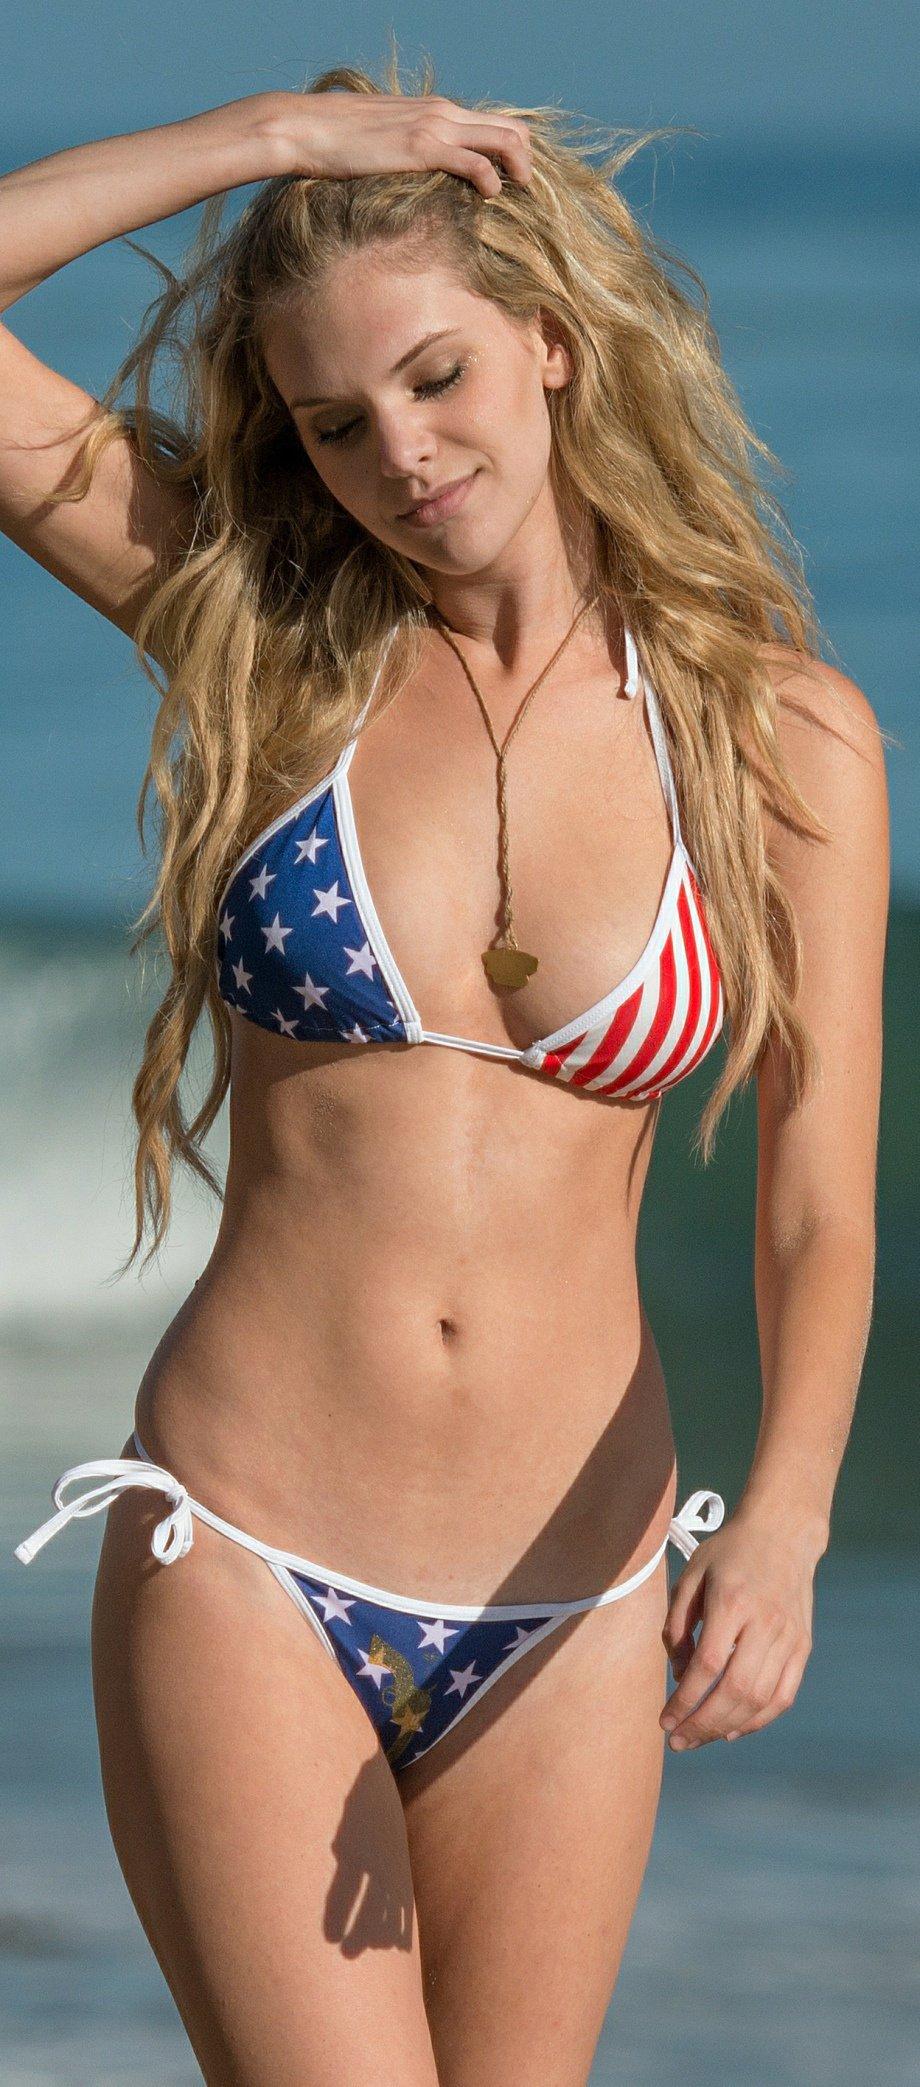 usa-bikinis-021-07042015.jpg